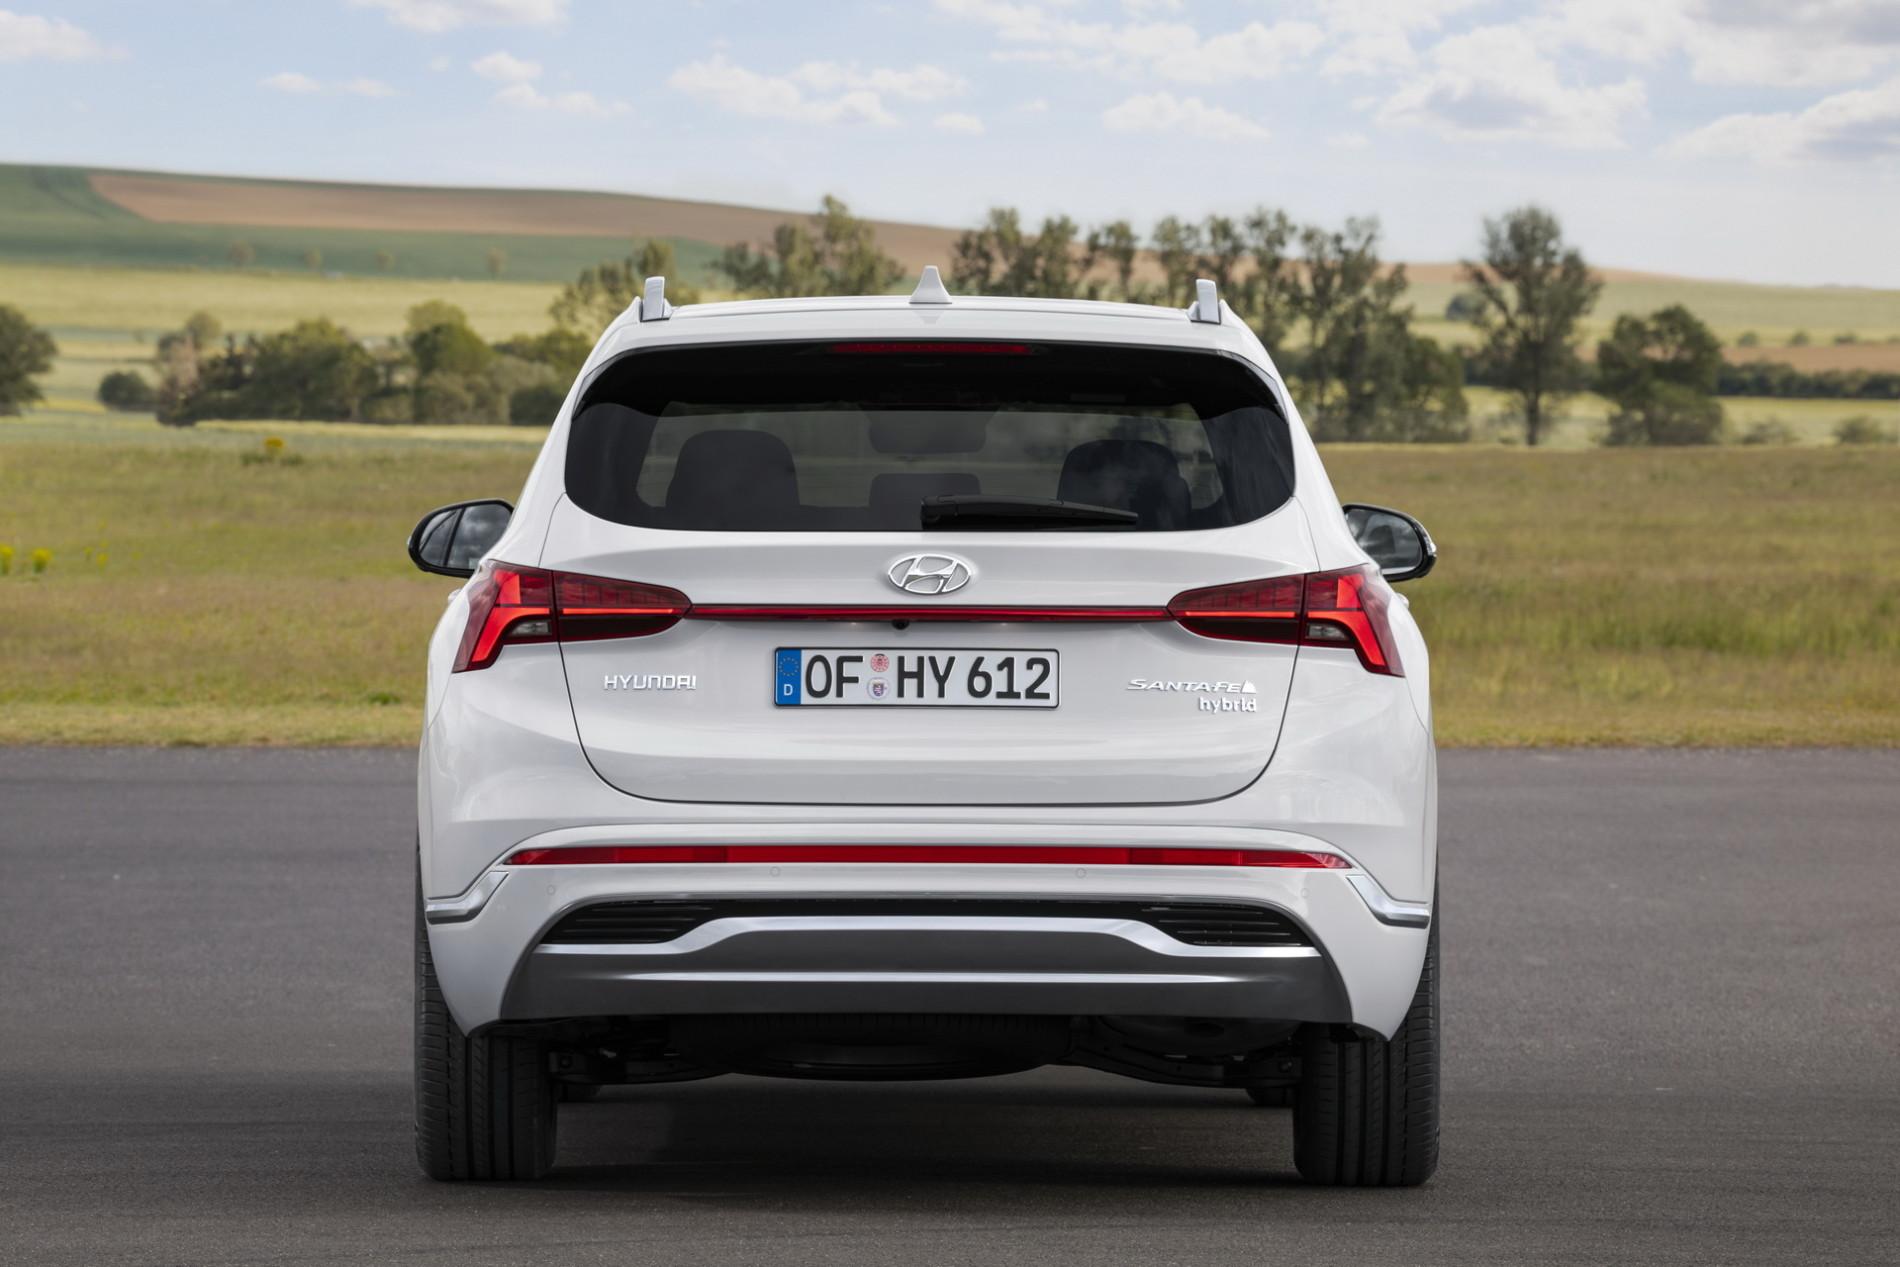 Noul Hyundai Santa Fe - Noul Hyundai Santa Fe